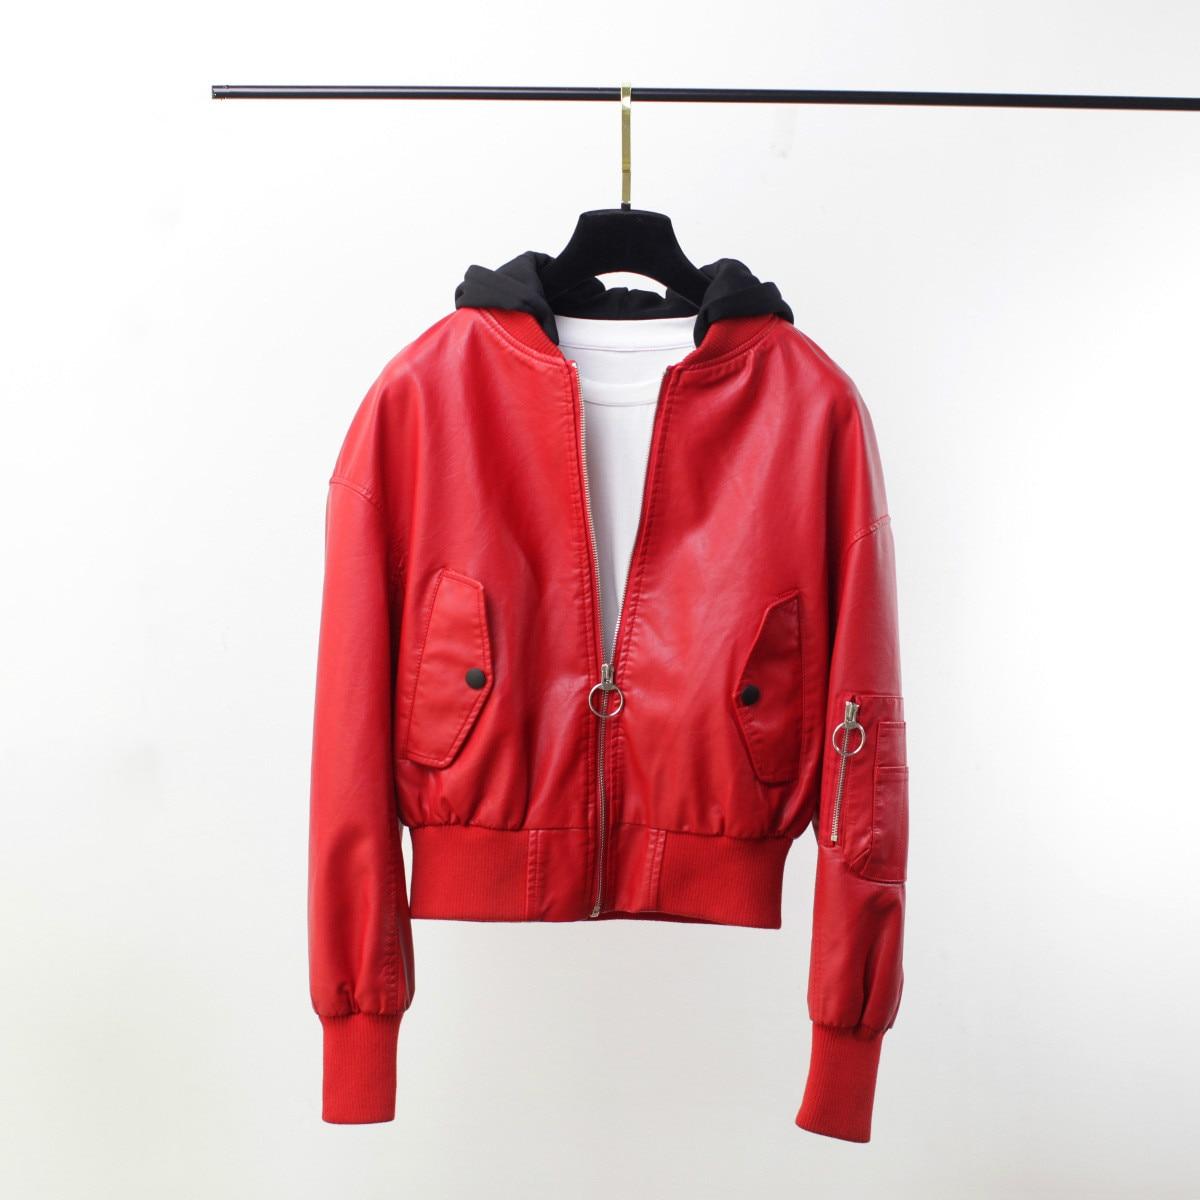 Girls Motorcycle Coat Women Autumn Hooded PU Faux   Leather   Jacket Female Baseball Outerwear Loose Short Long Sleeve Red Jacket